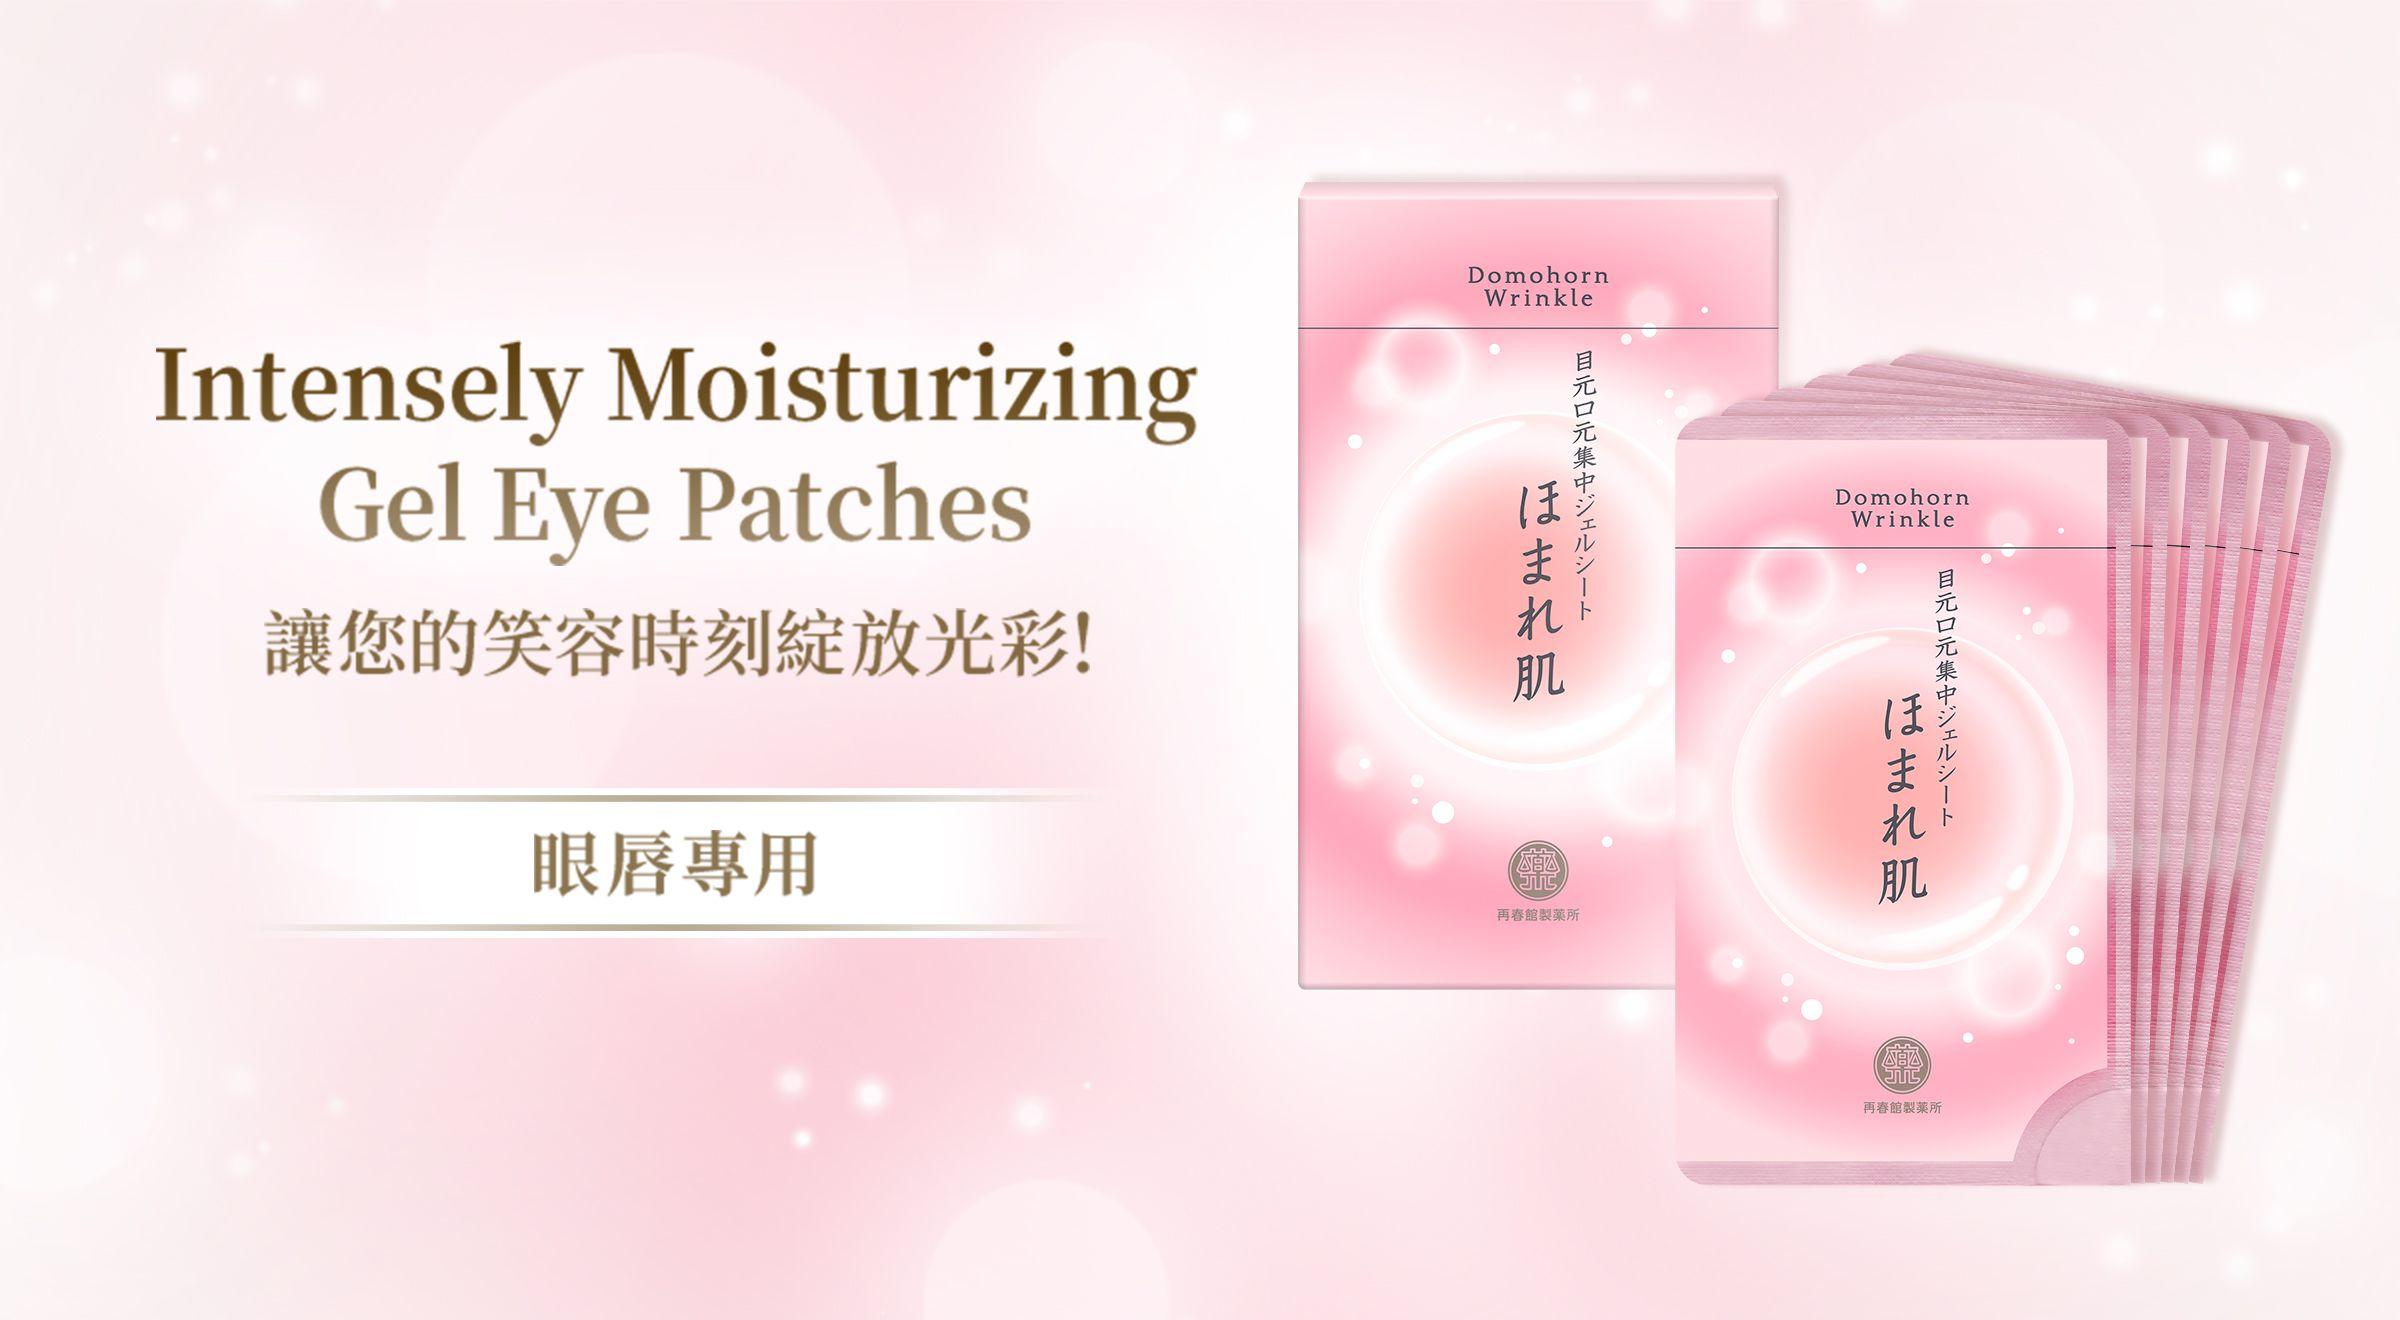 Intensely Moisturizing Gel Eye Patches 讓您的笑容時刻綻放光彩! 眼唇專用